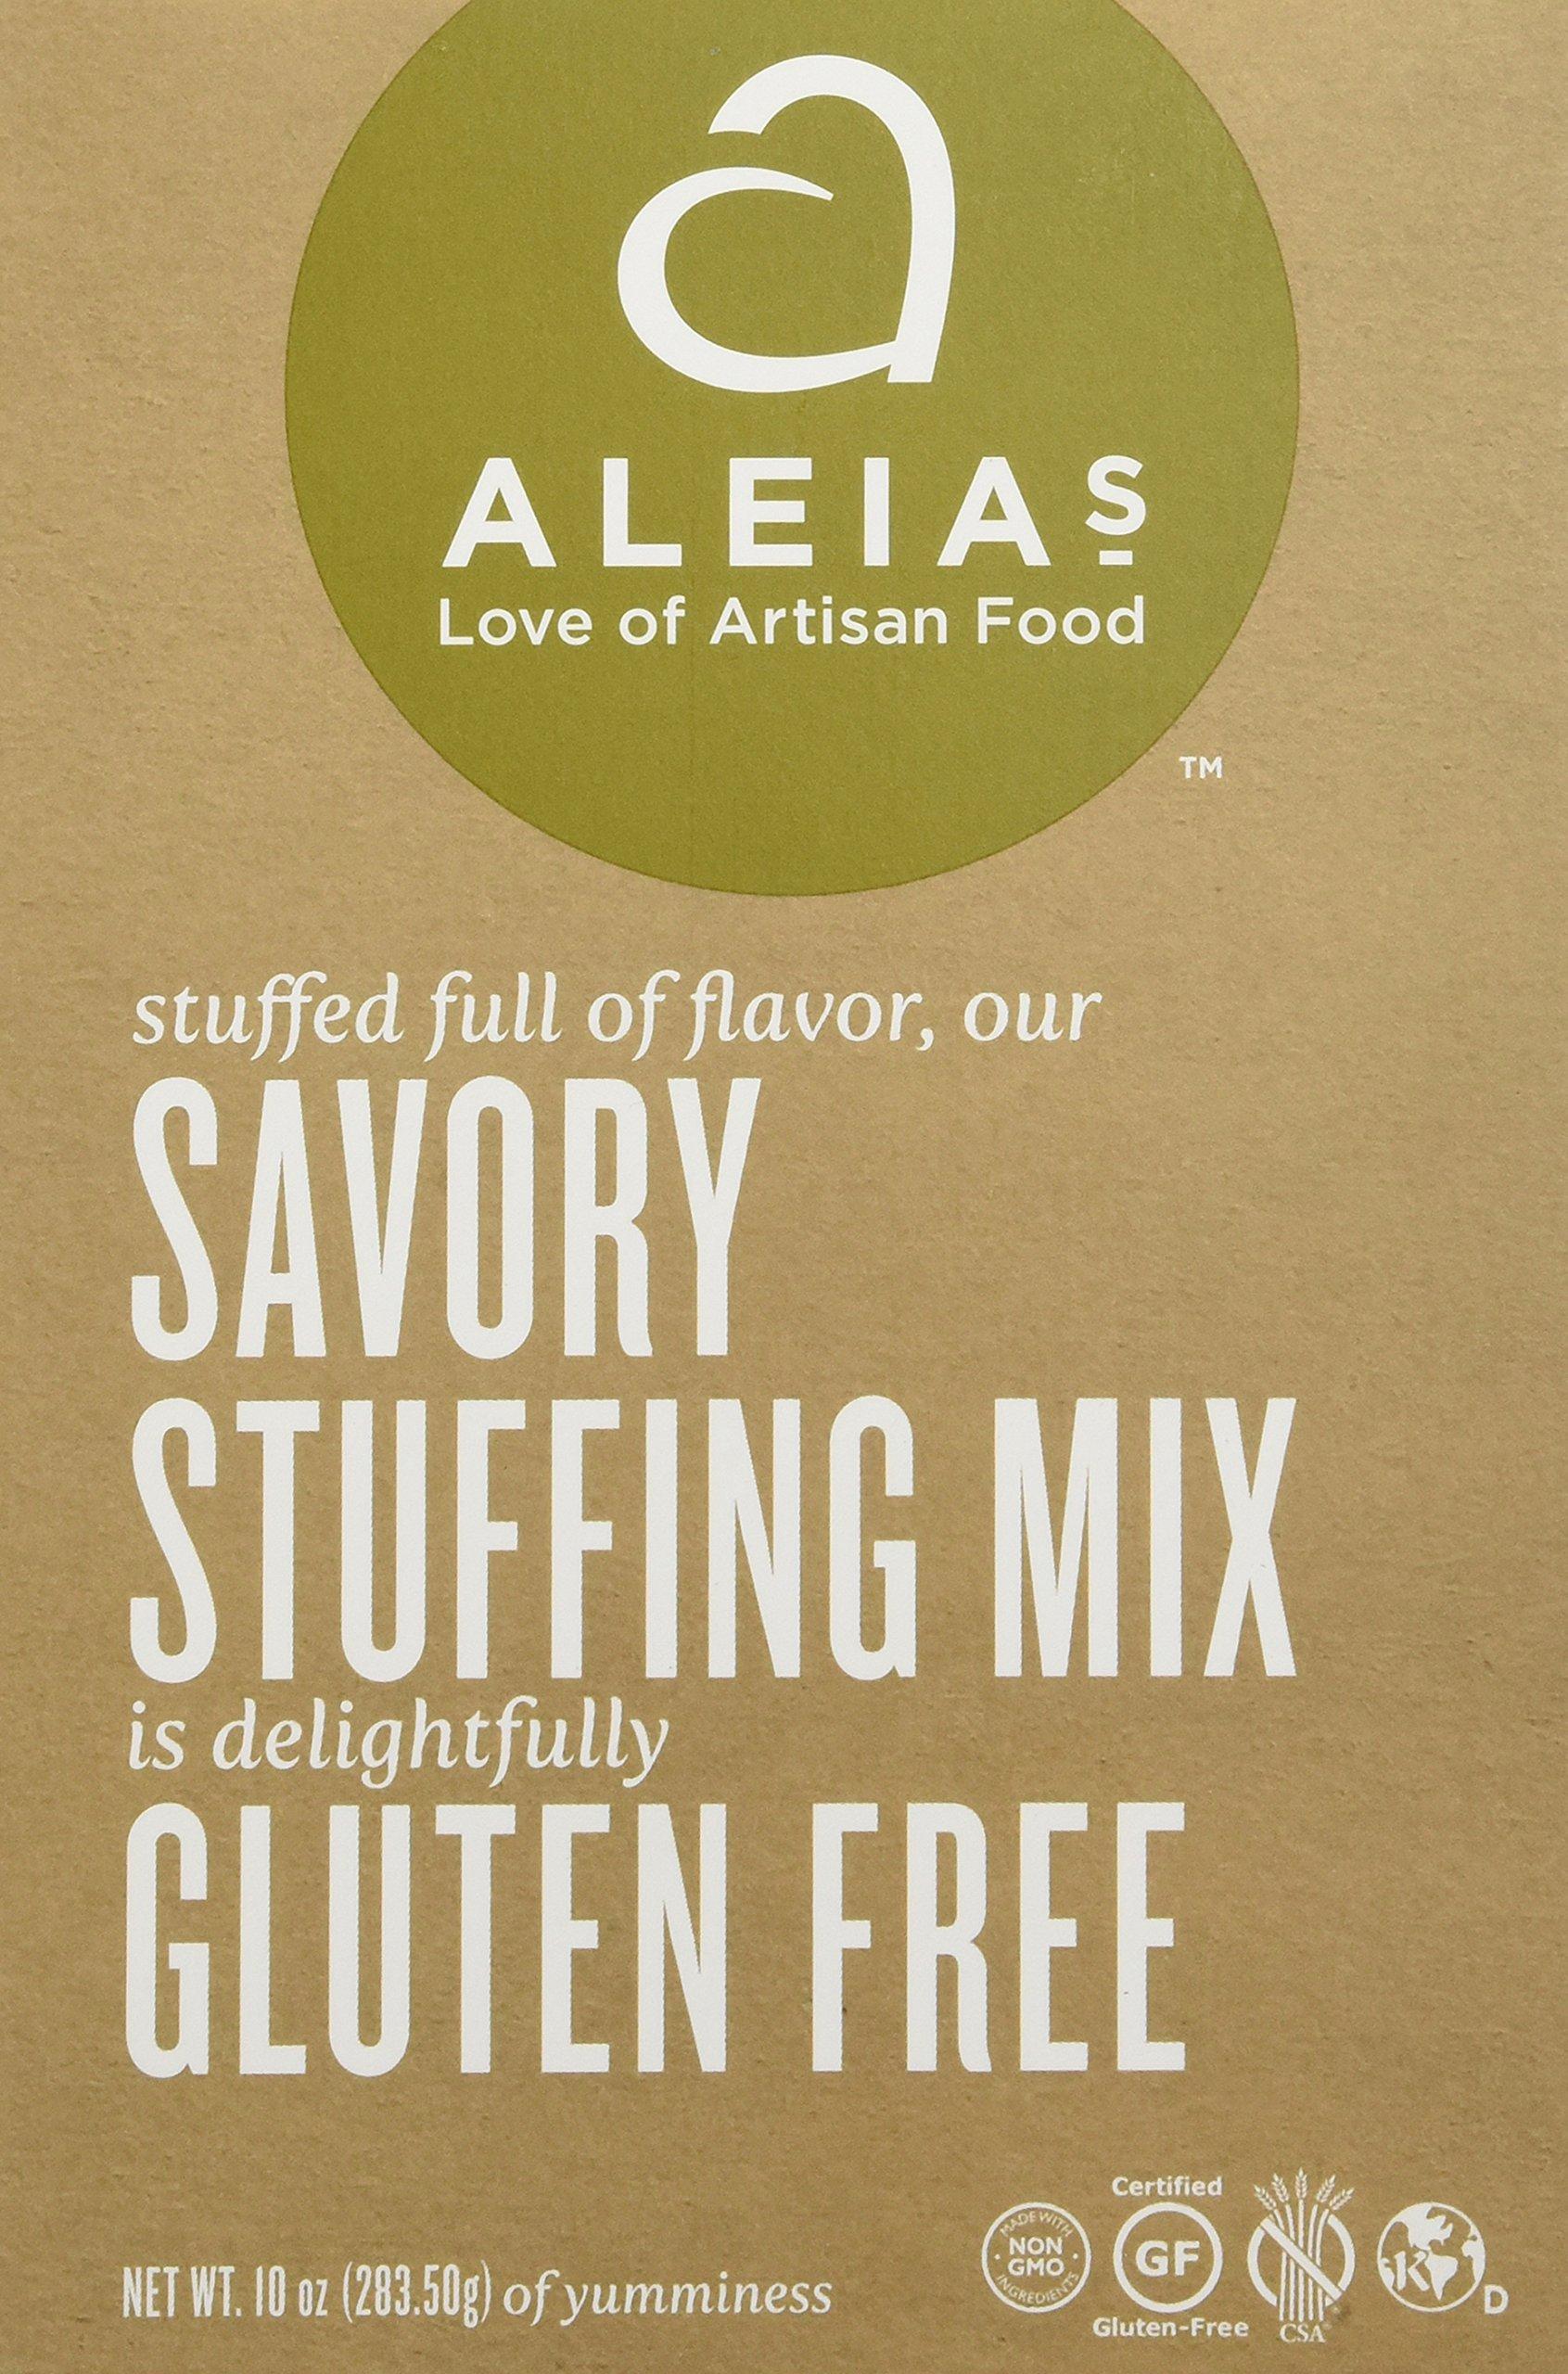 Aleia's Gluten-Free Savory Stuffing - 1 Pack 10oz by Aleias